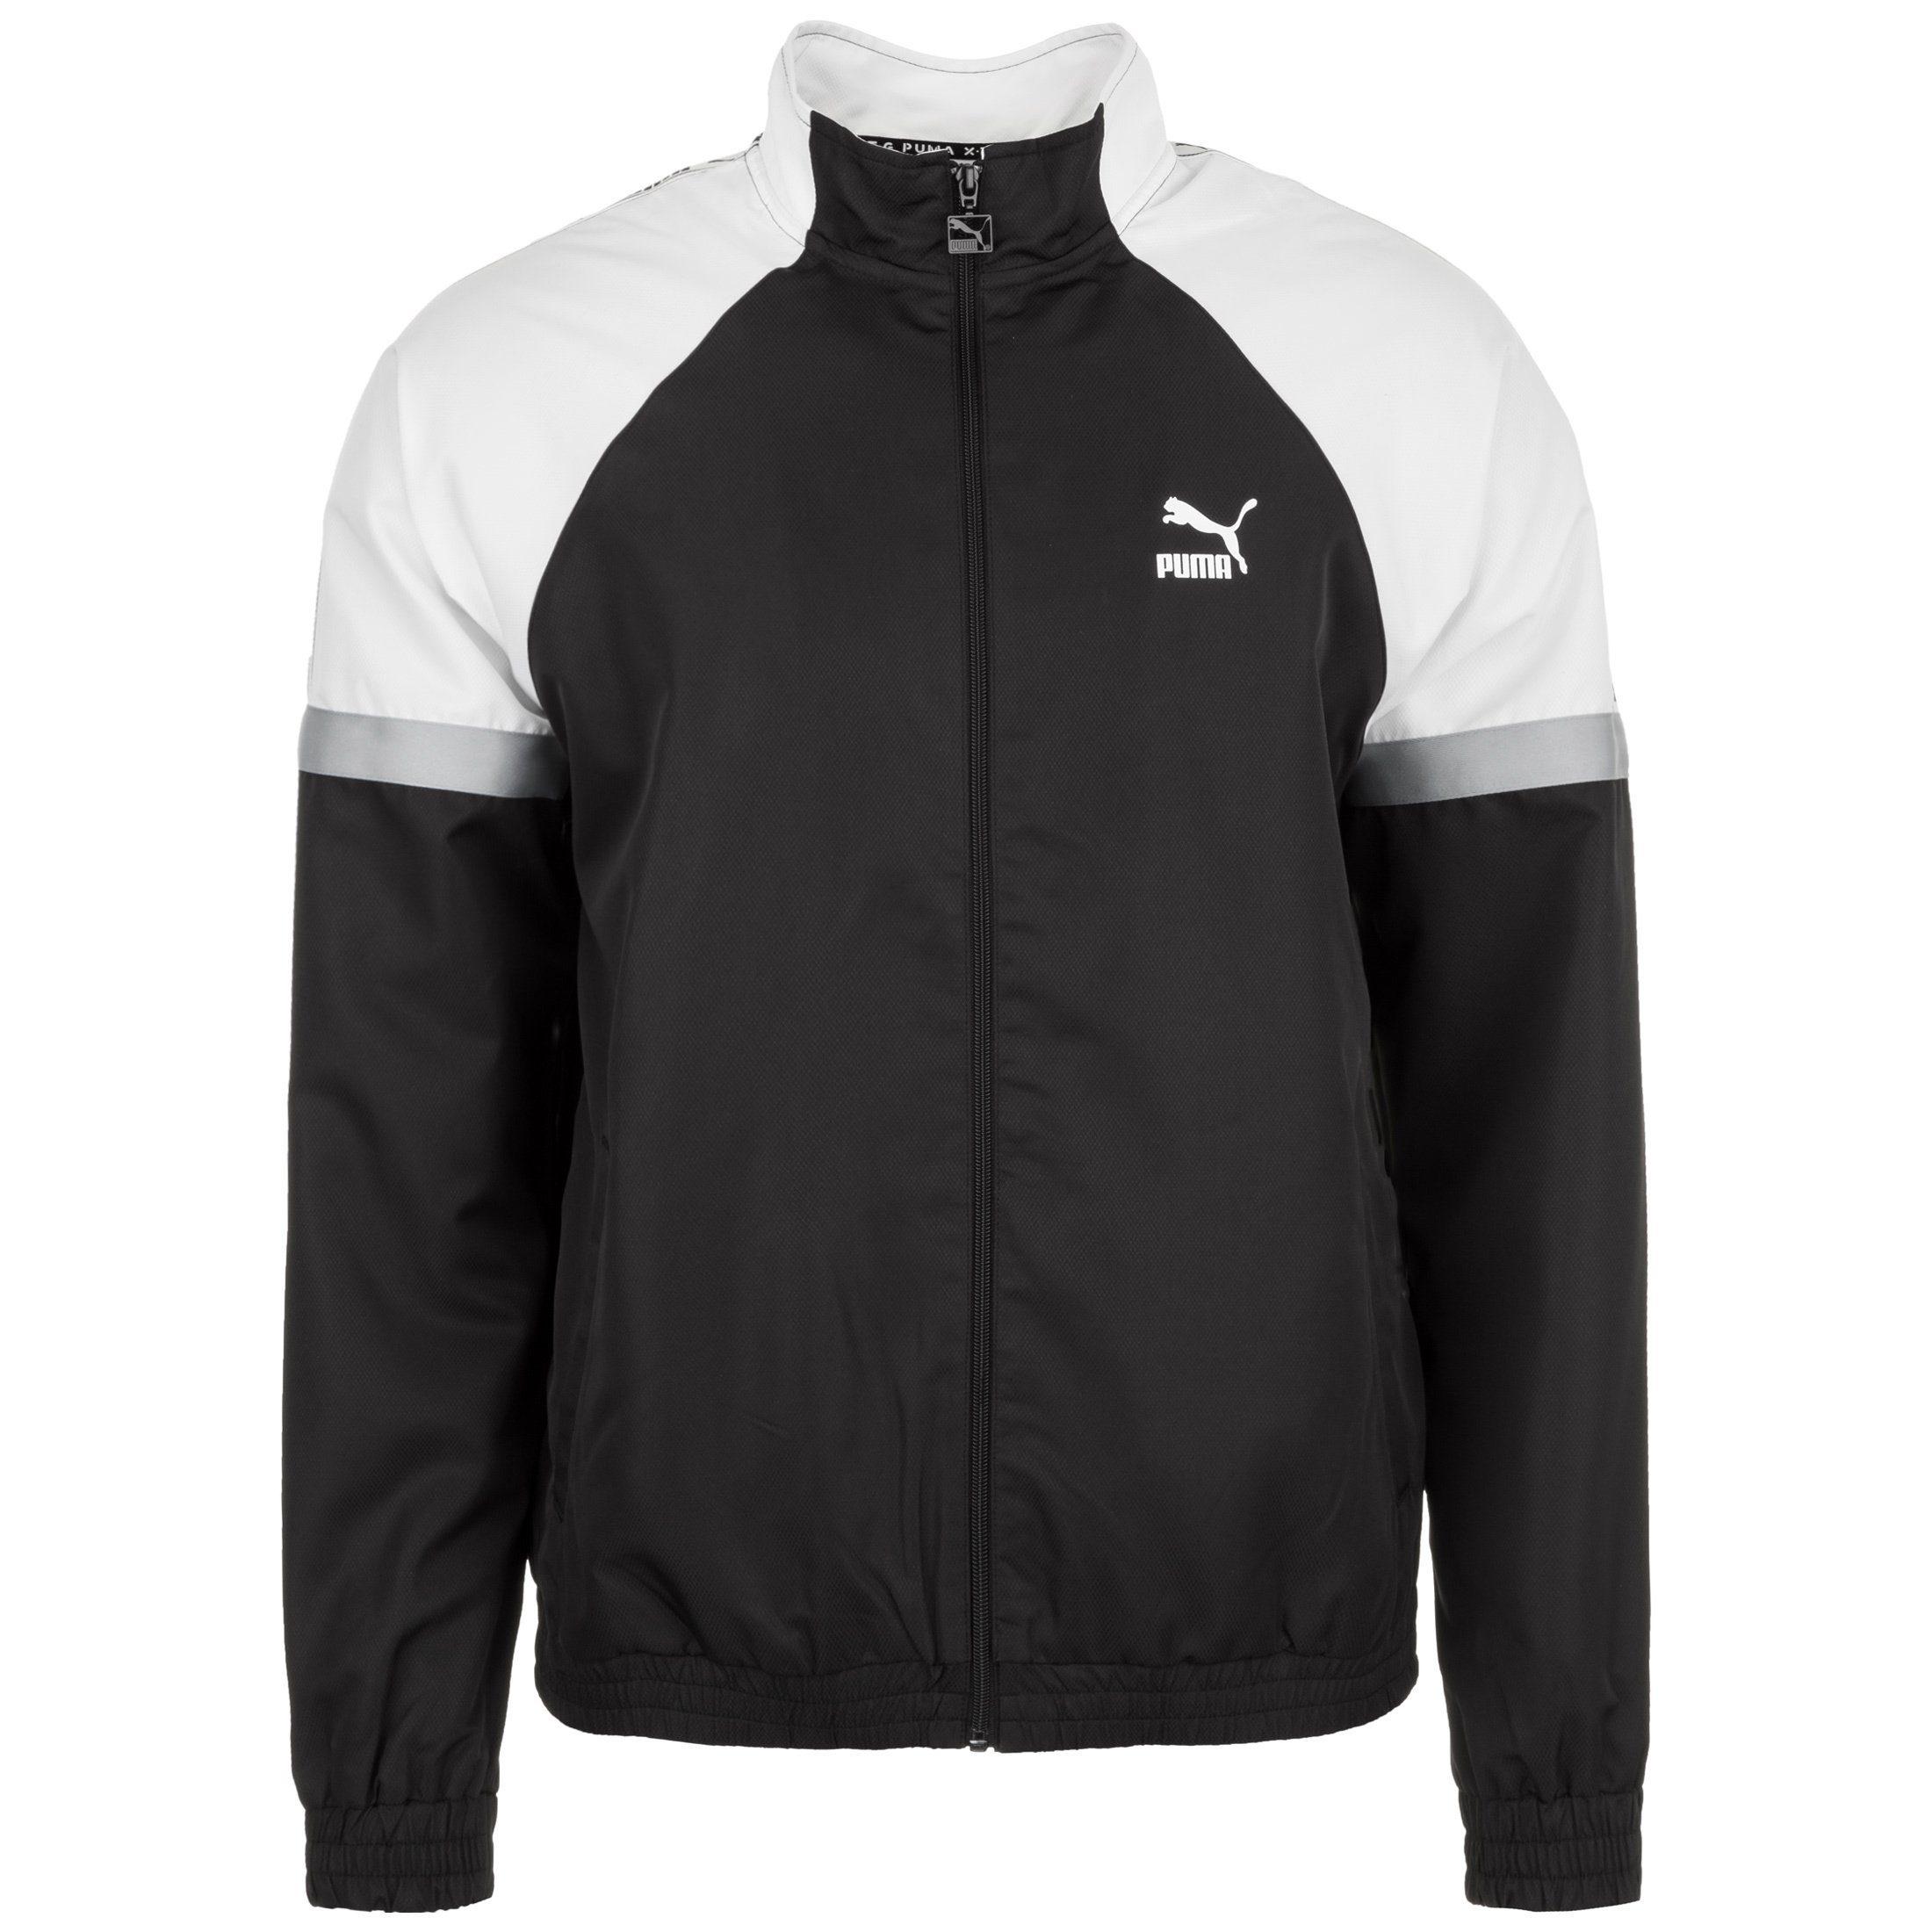 PUMA Trainingsjacke Xtg Woven | Sportbekleidung > Sportjacken > Trainingsjacken | Schwarz | Puma